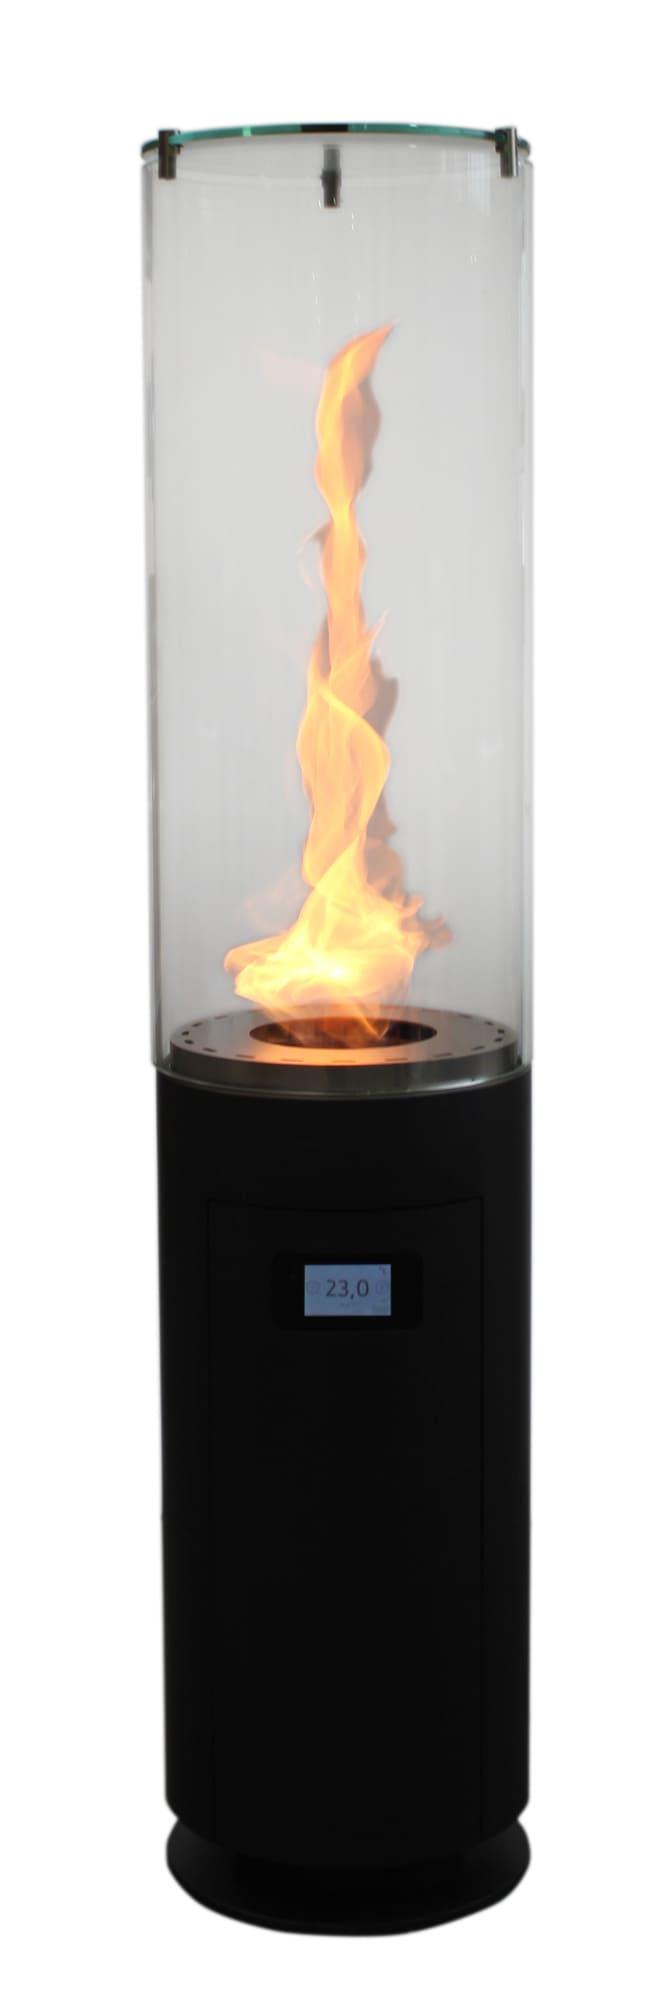 Ethanol-Kamin Spartherm ebios-fire Nano